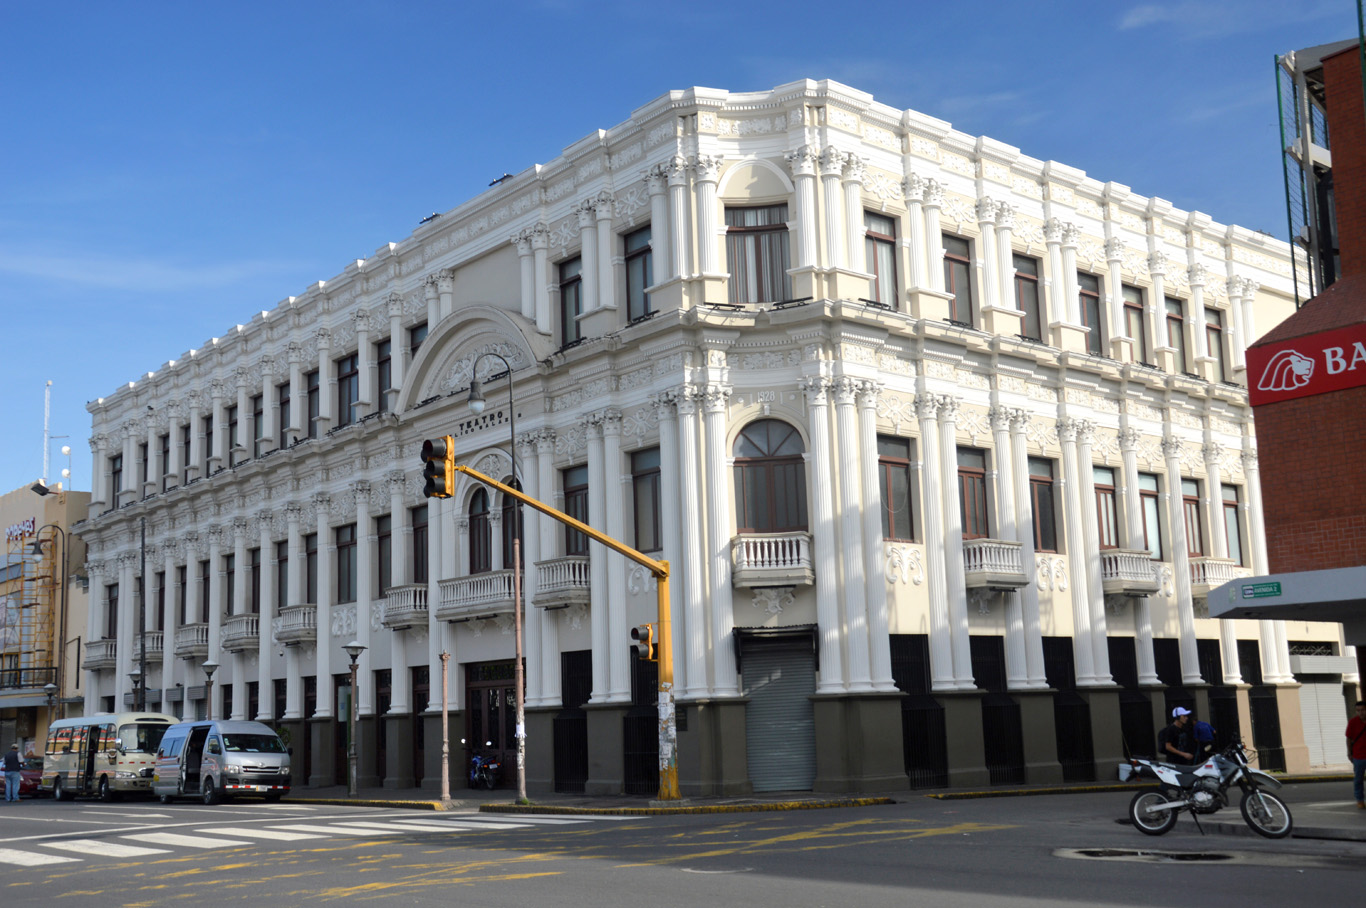 The Melico Salazar Theatre